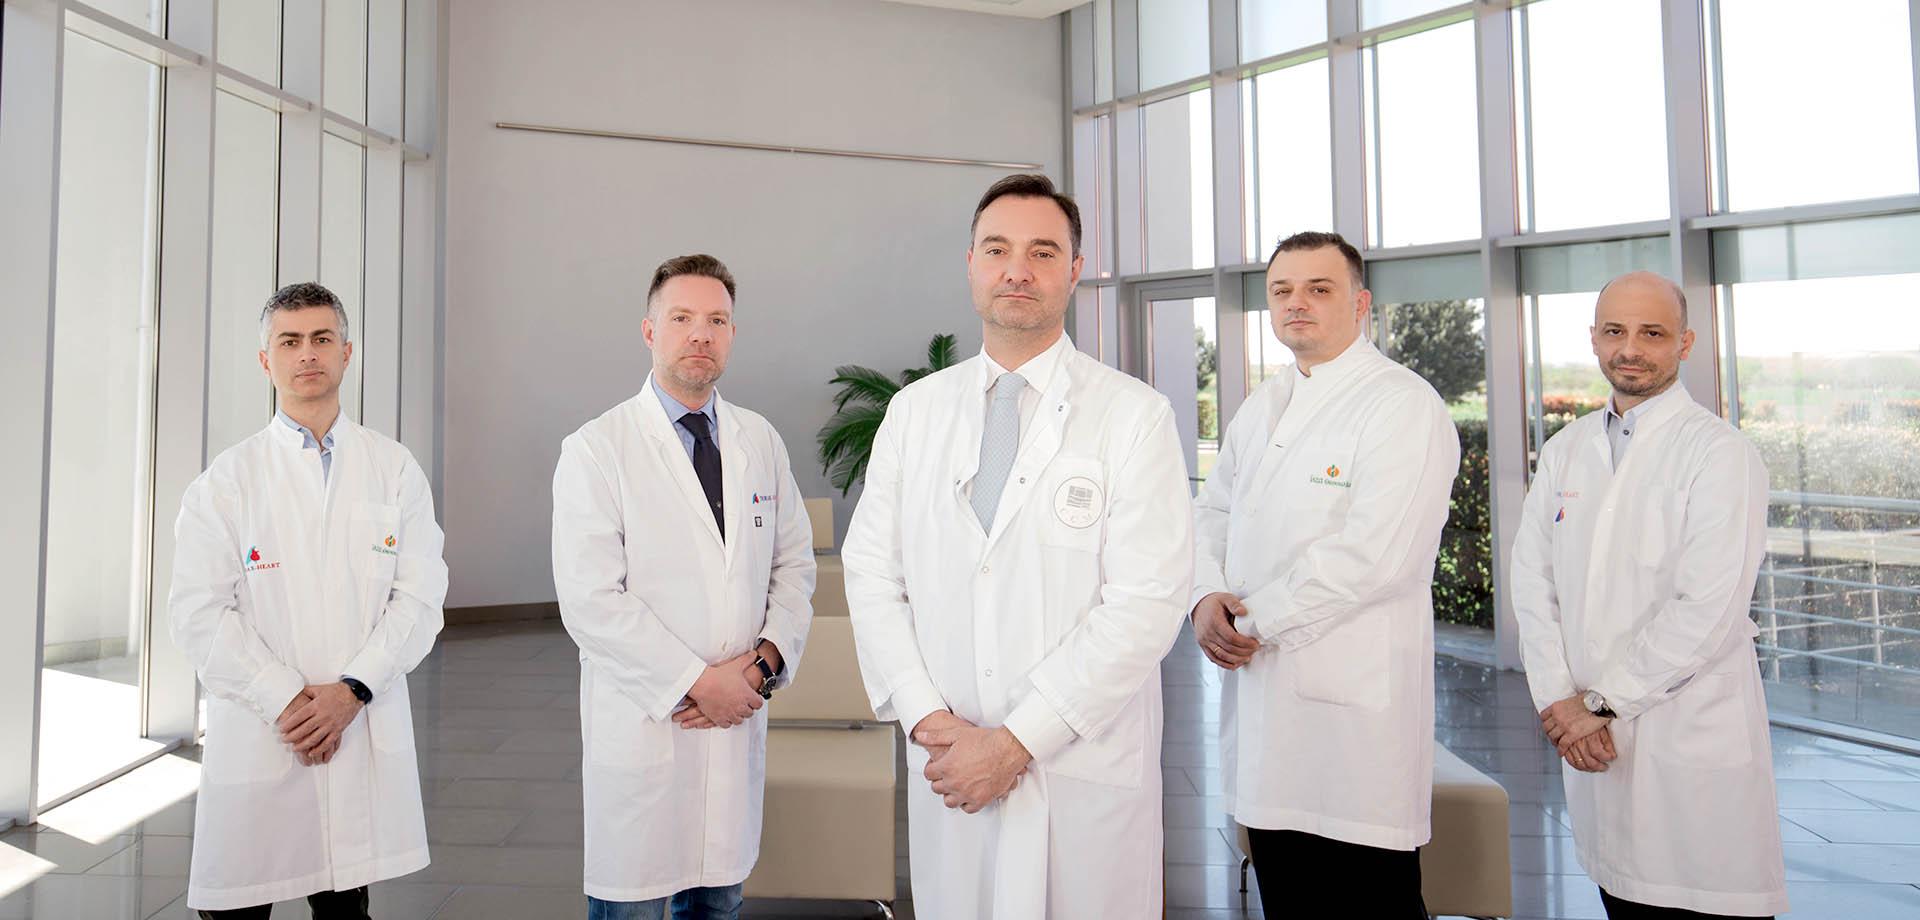 Thorax Heart Καρδιοθωρακοχειρουργική ομάδα